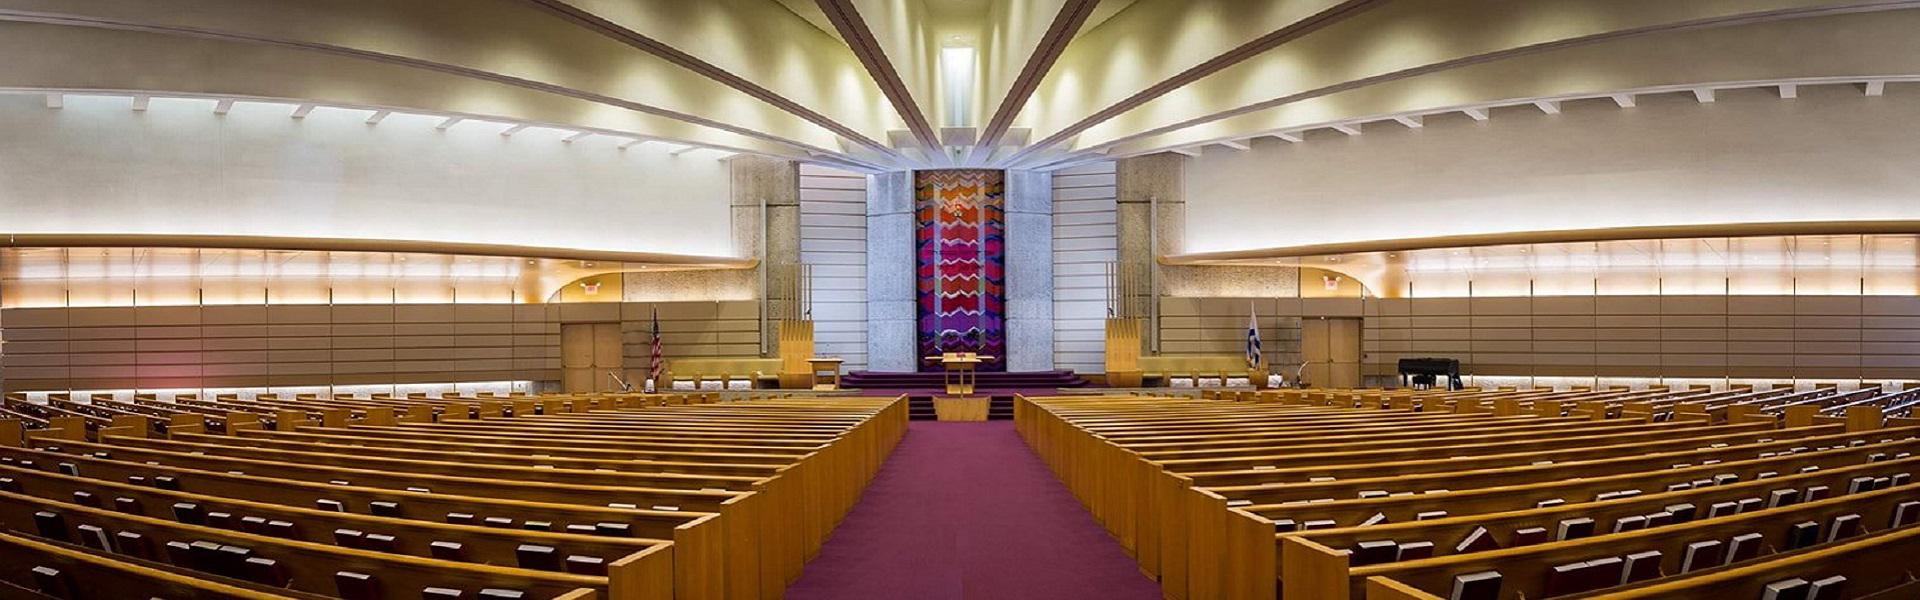 adat-shalom-sanctuary-2019-no-speakers-20210513-191056.jpg